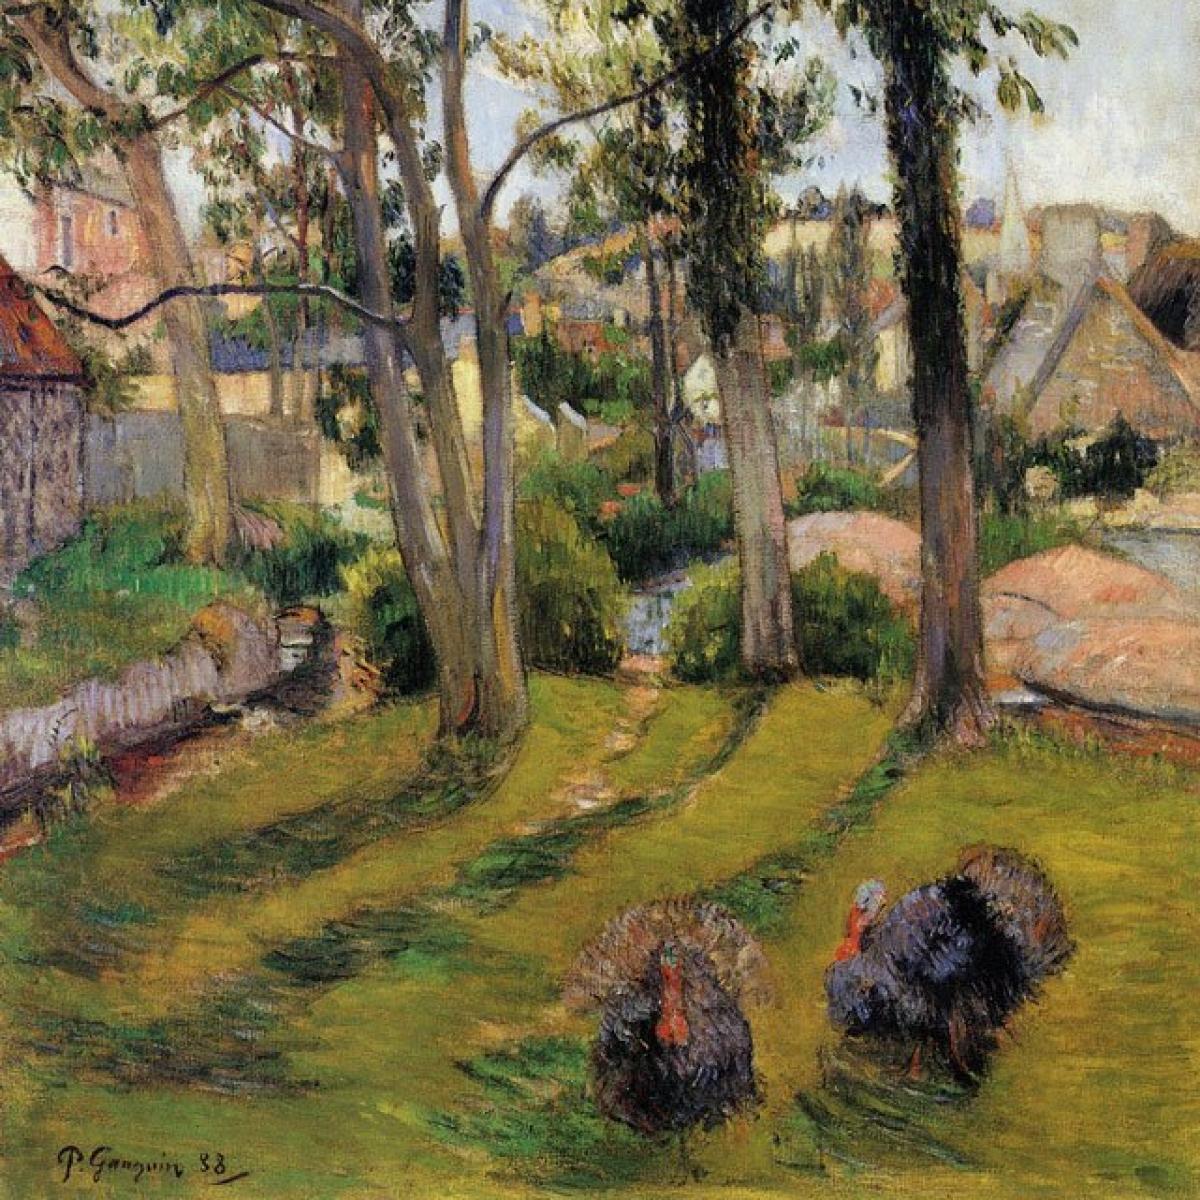 Rare Paul Gauguin painting up for auction in Paris